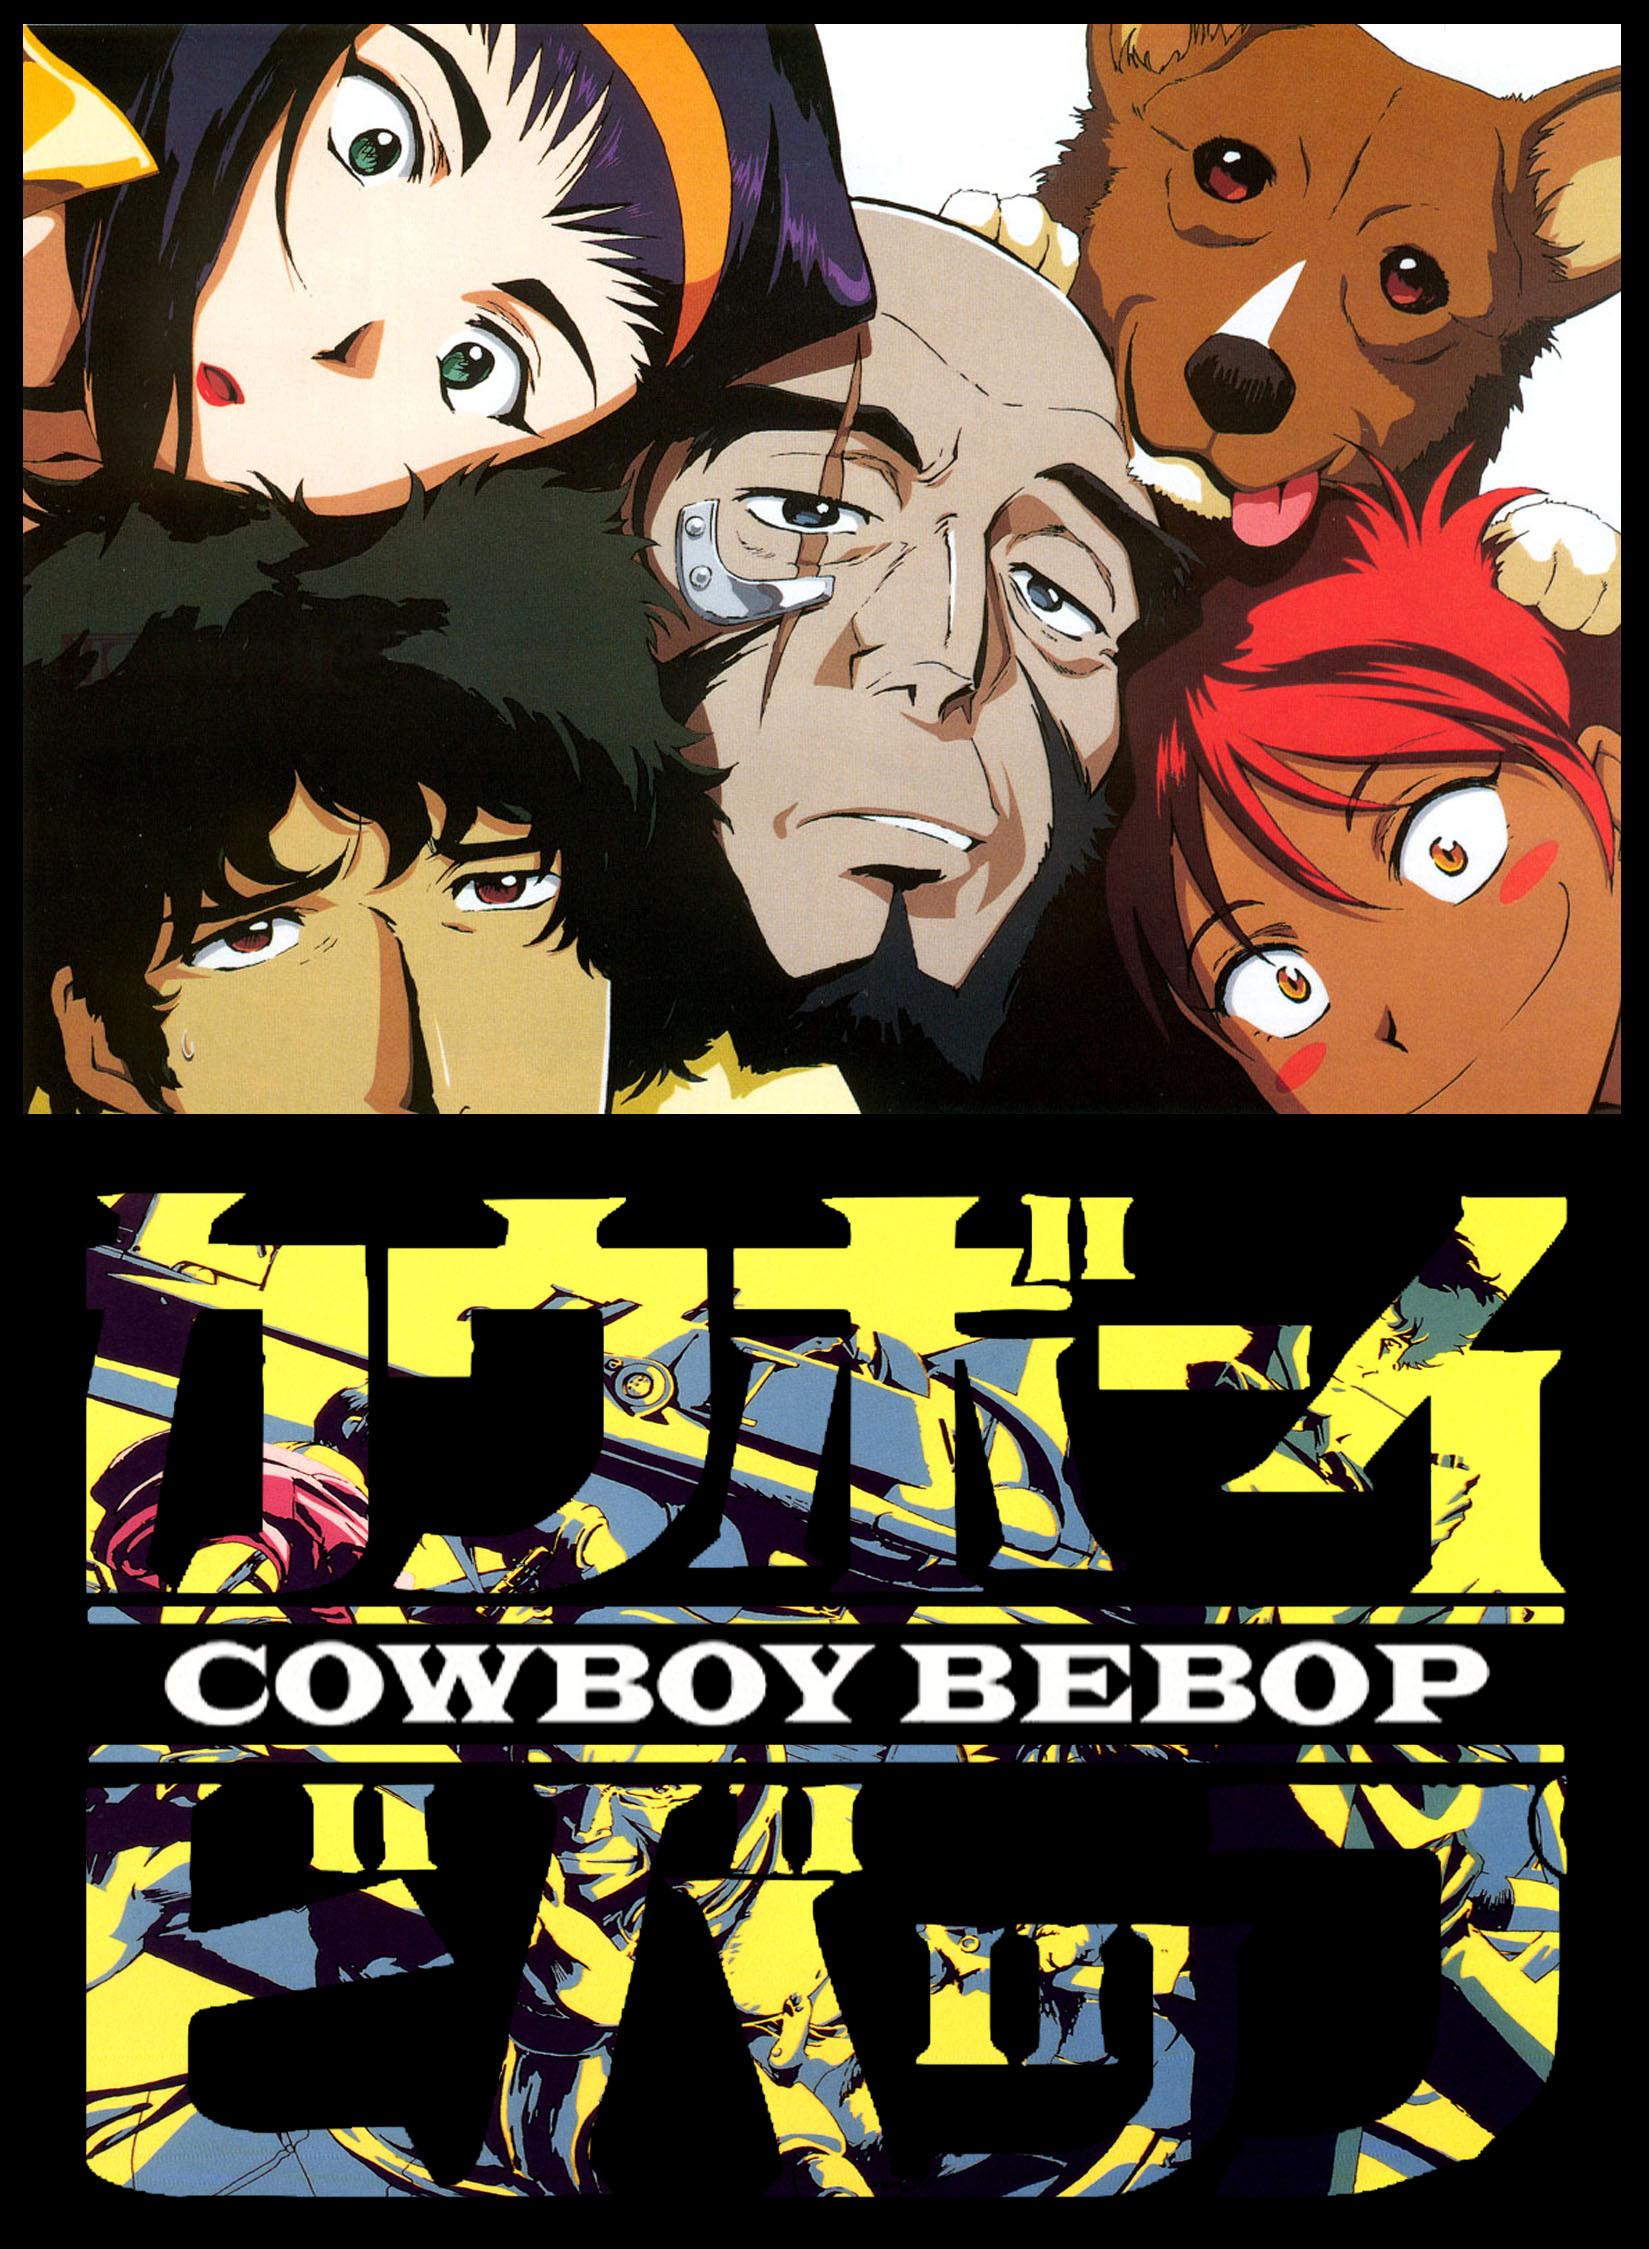 Cowboy Bebop Phone Wallpaper (66+ images)